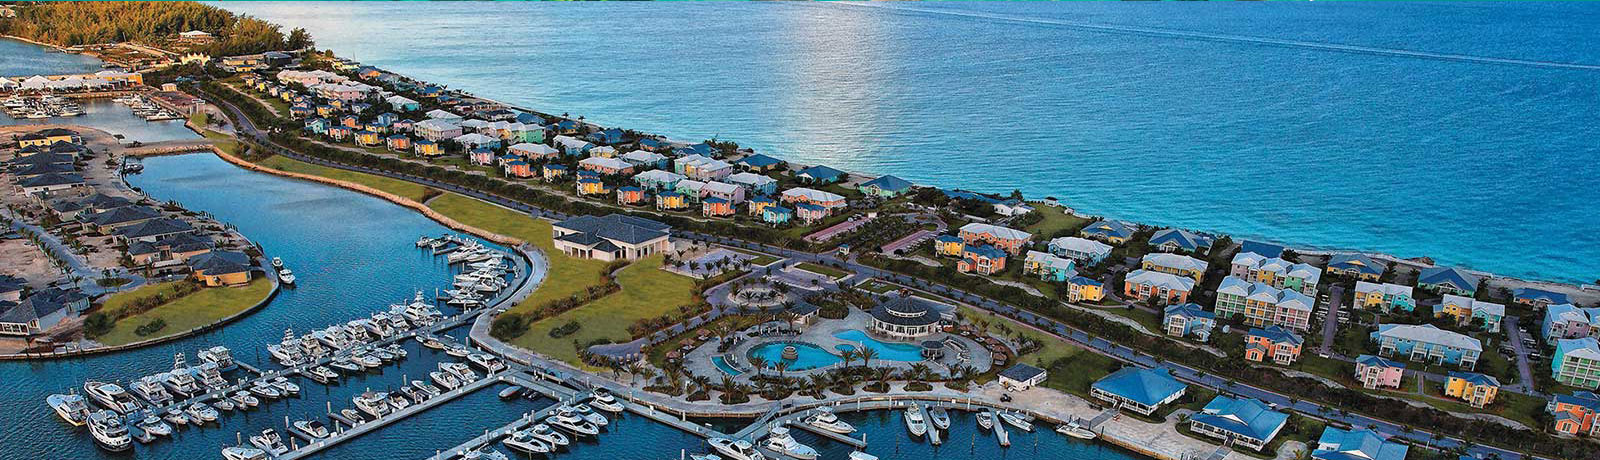 Resorts World Bimini Bay Hotel